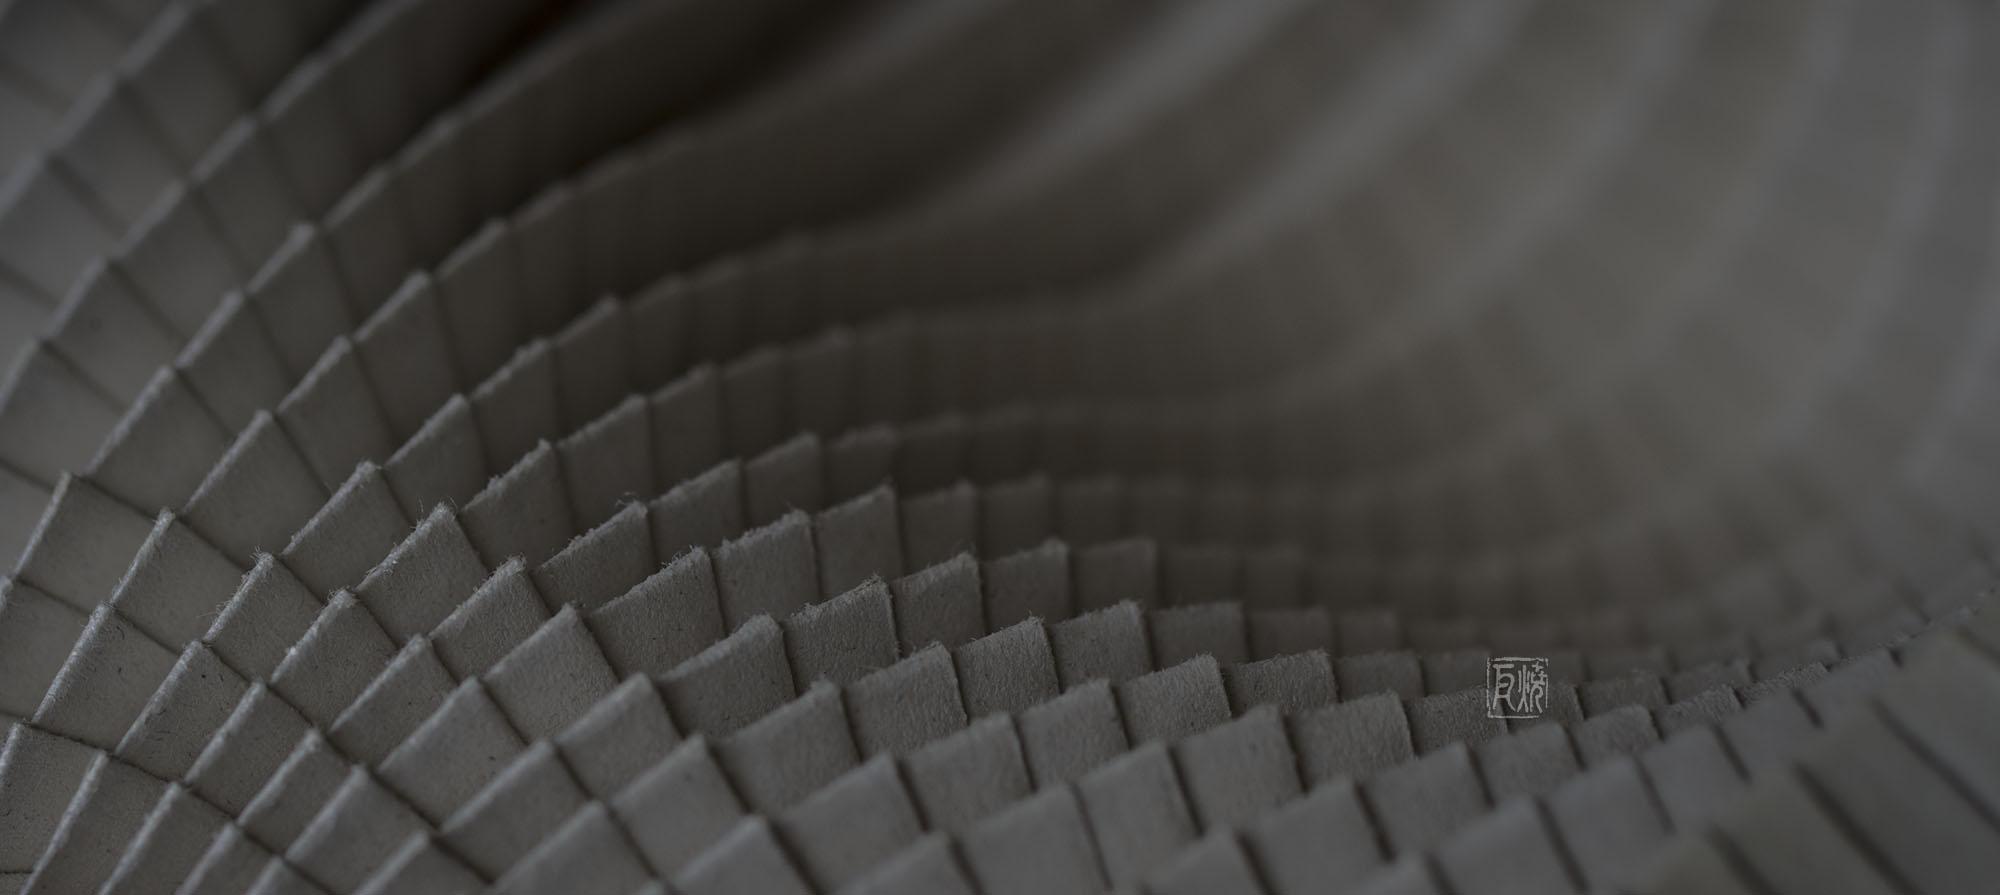 Origami - Foto: Frank Schindelbeck Fotografie